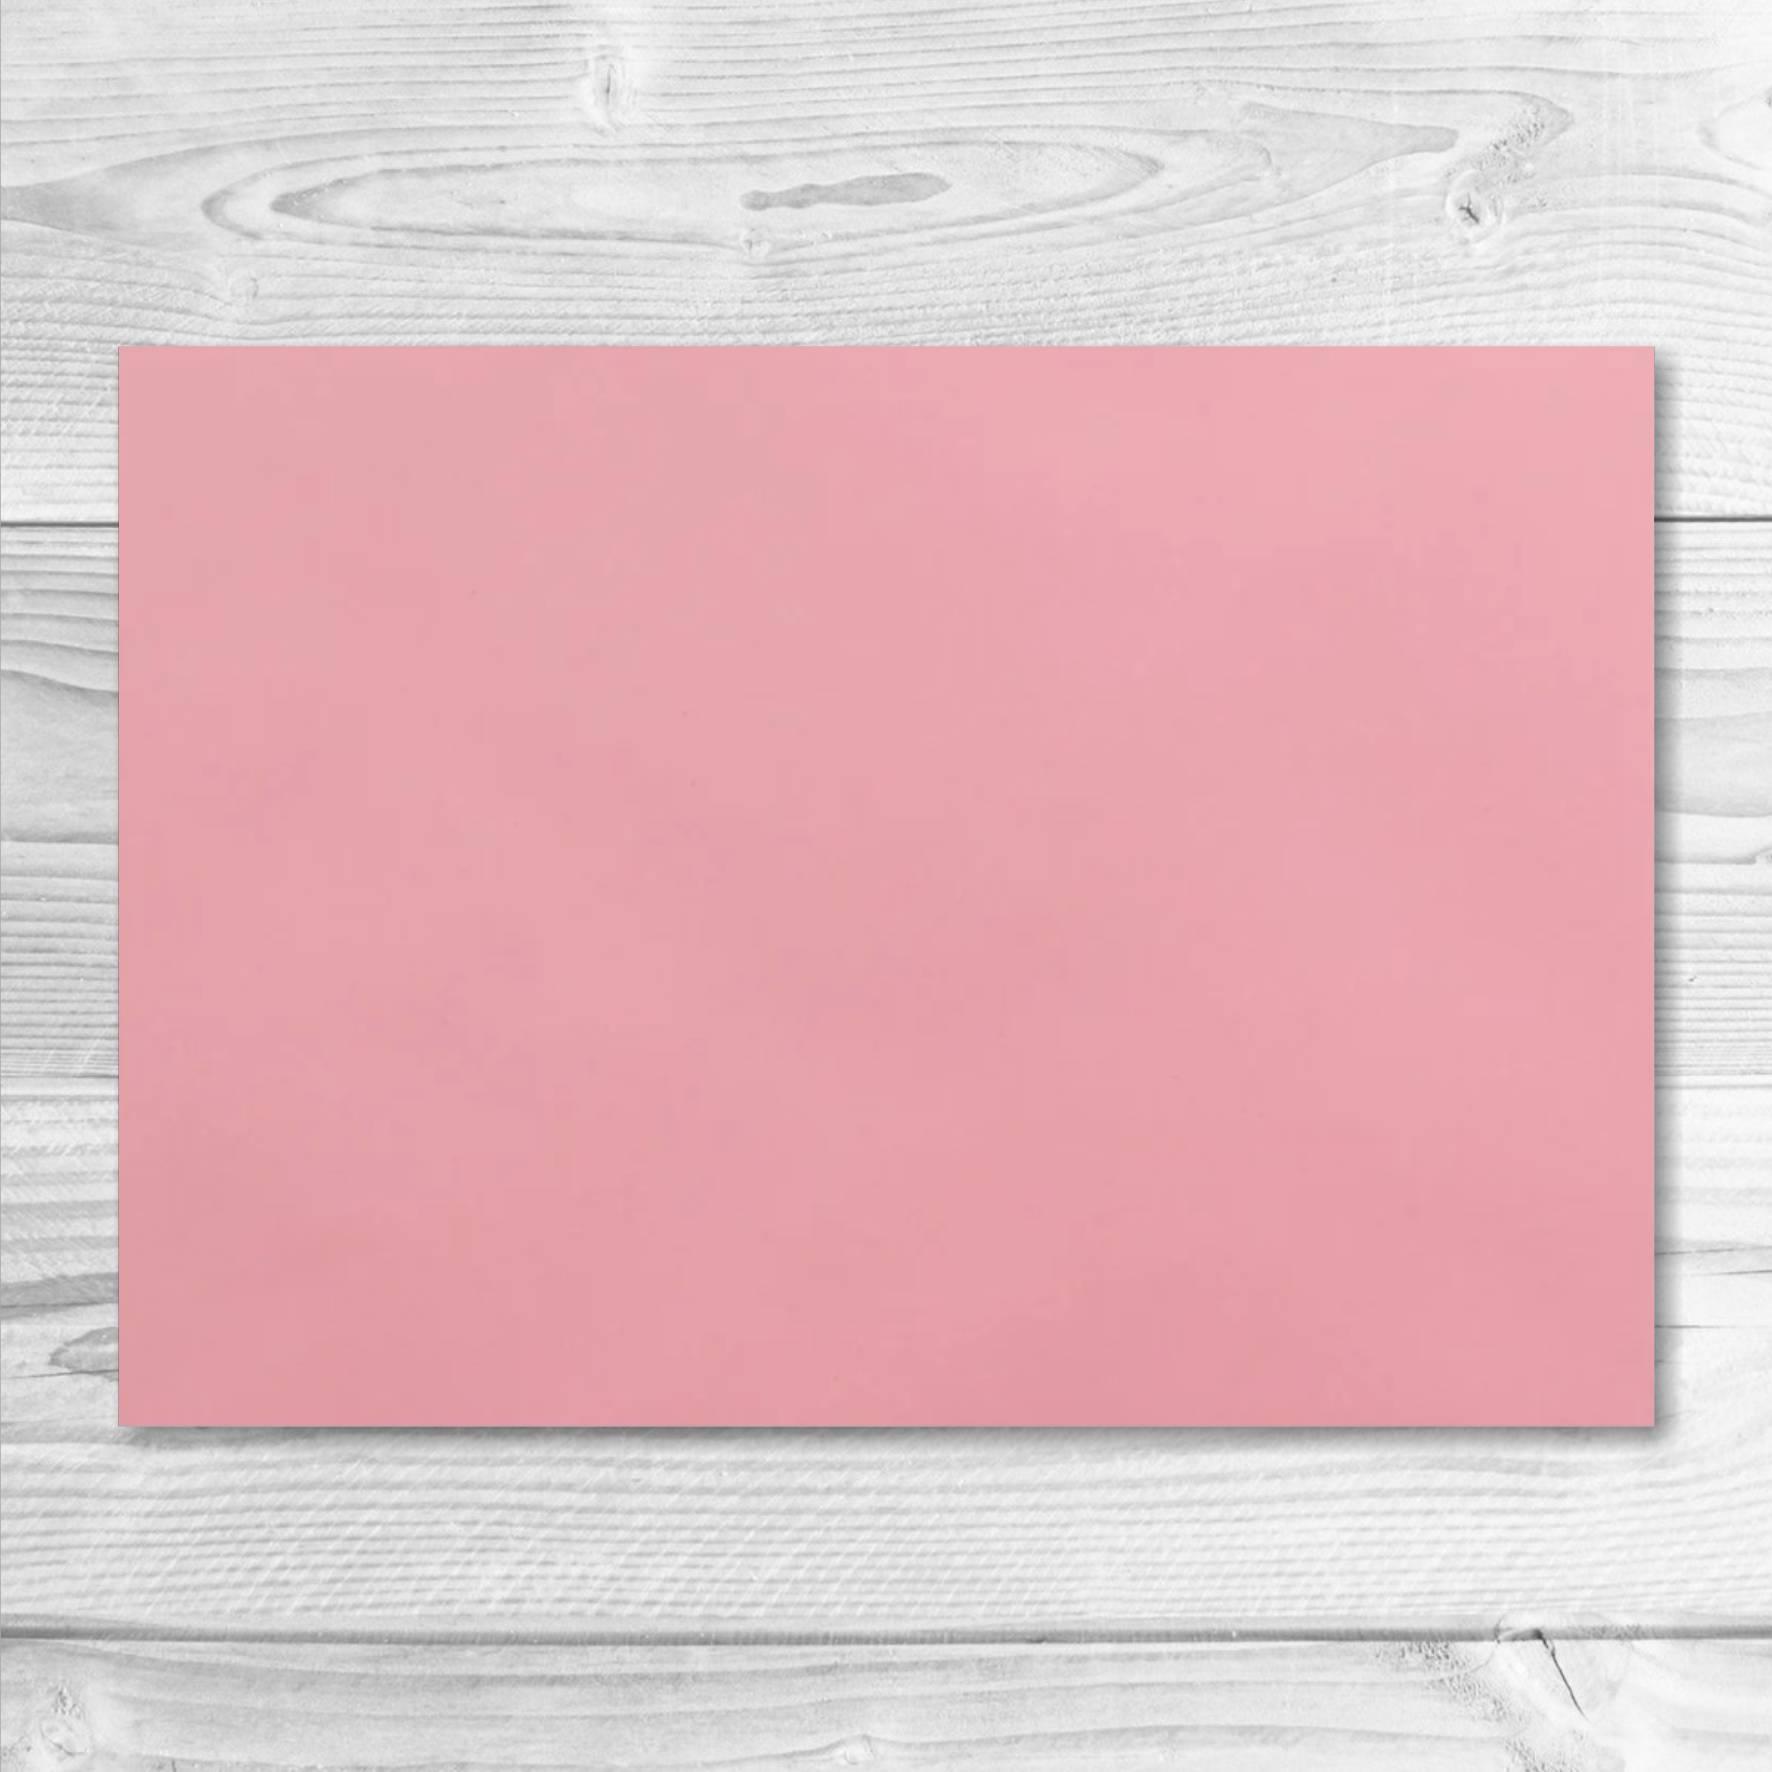 enveloppe rose pâle 13 x 19 cm